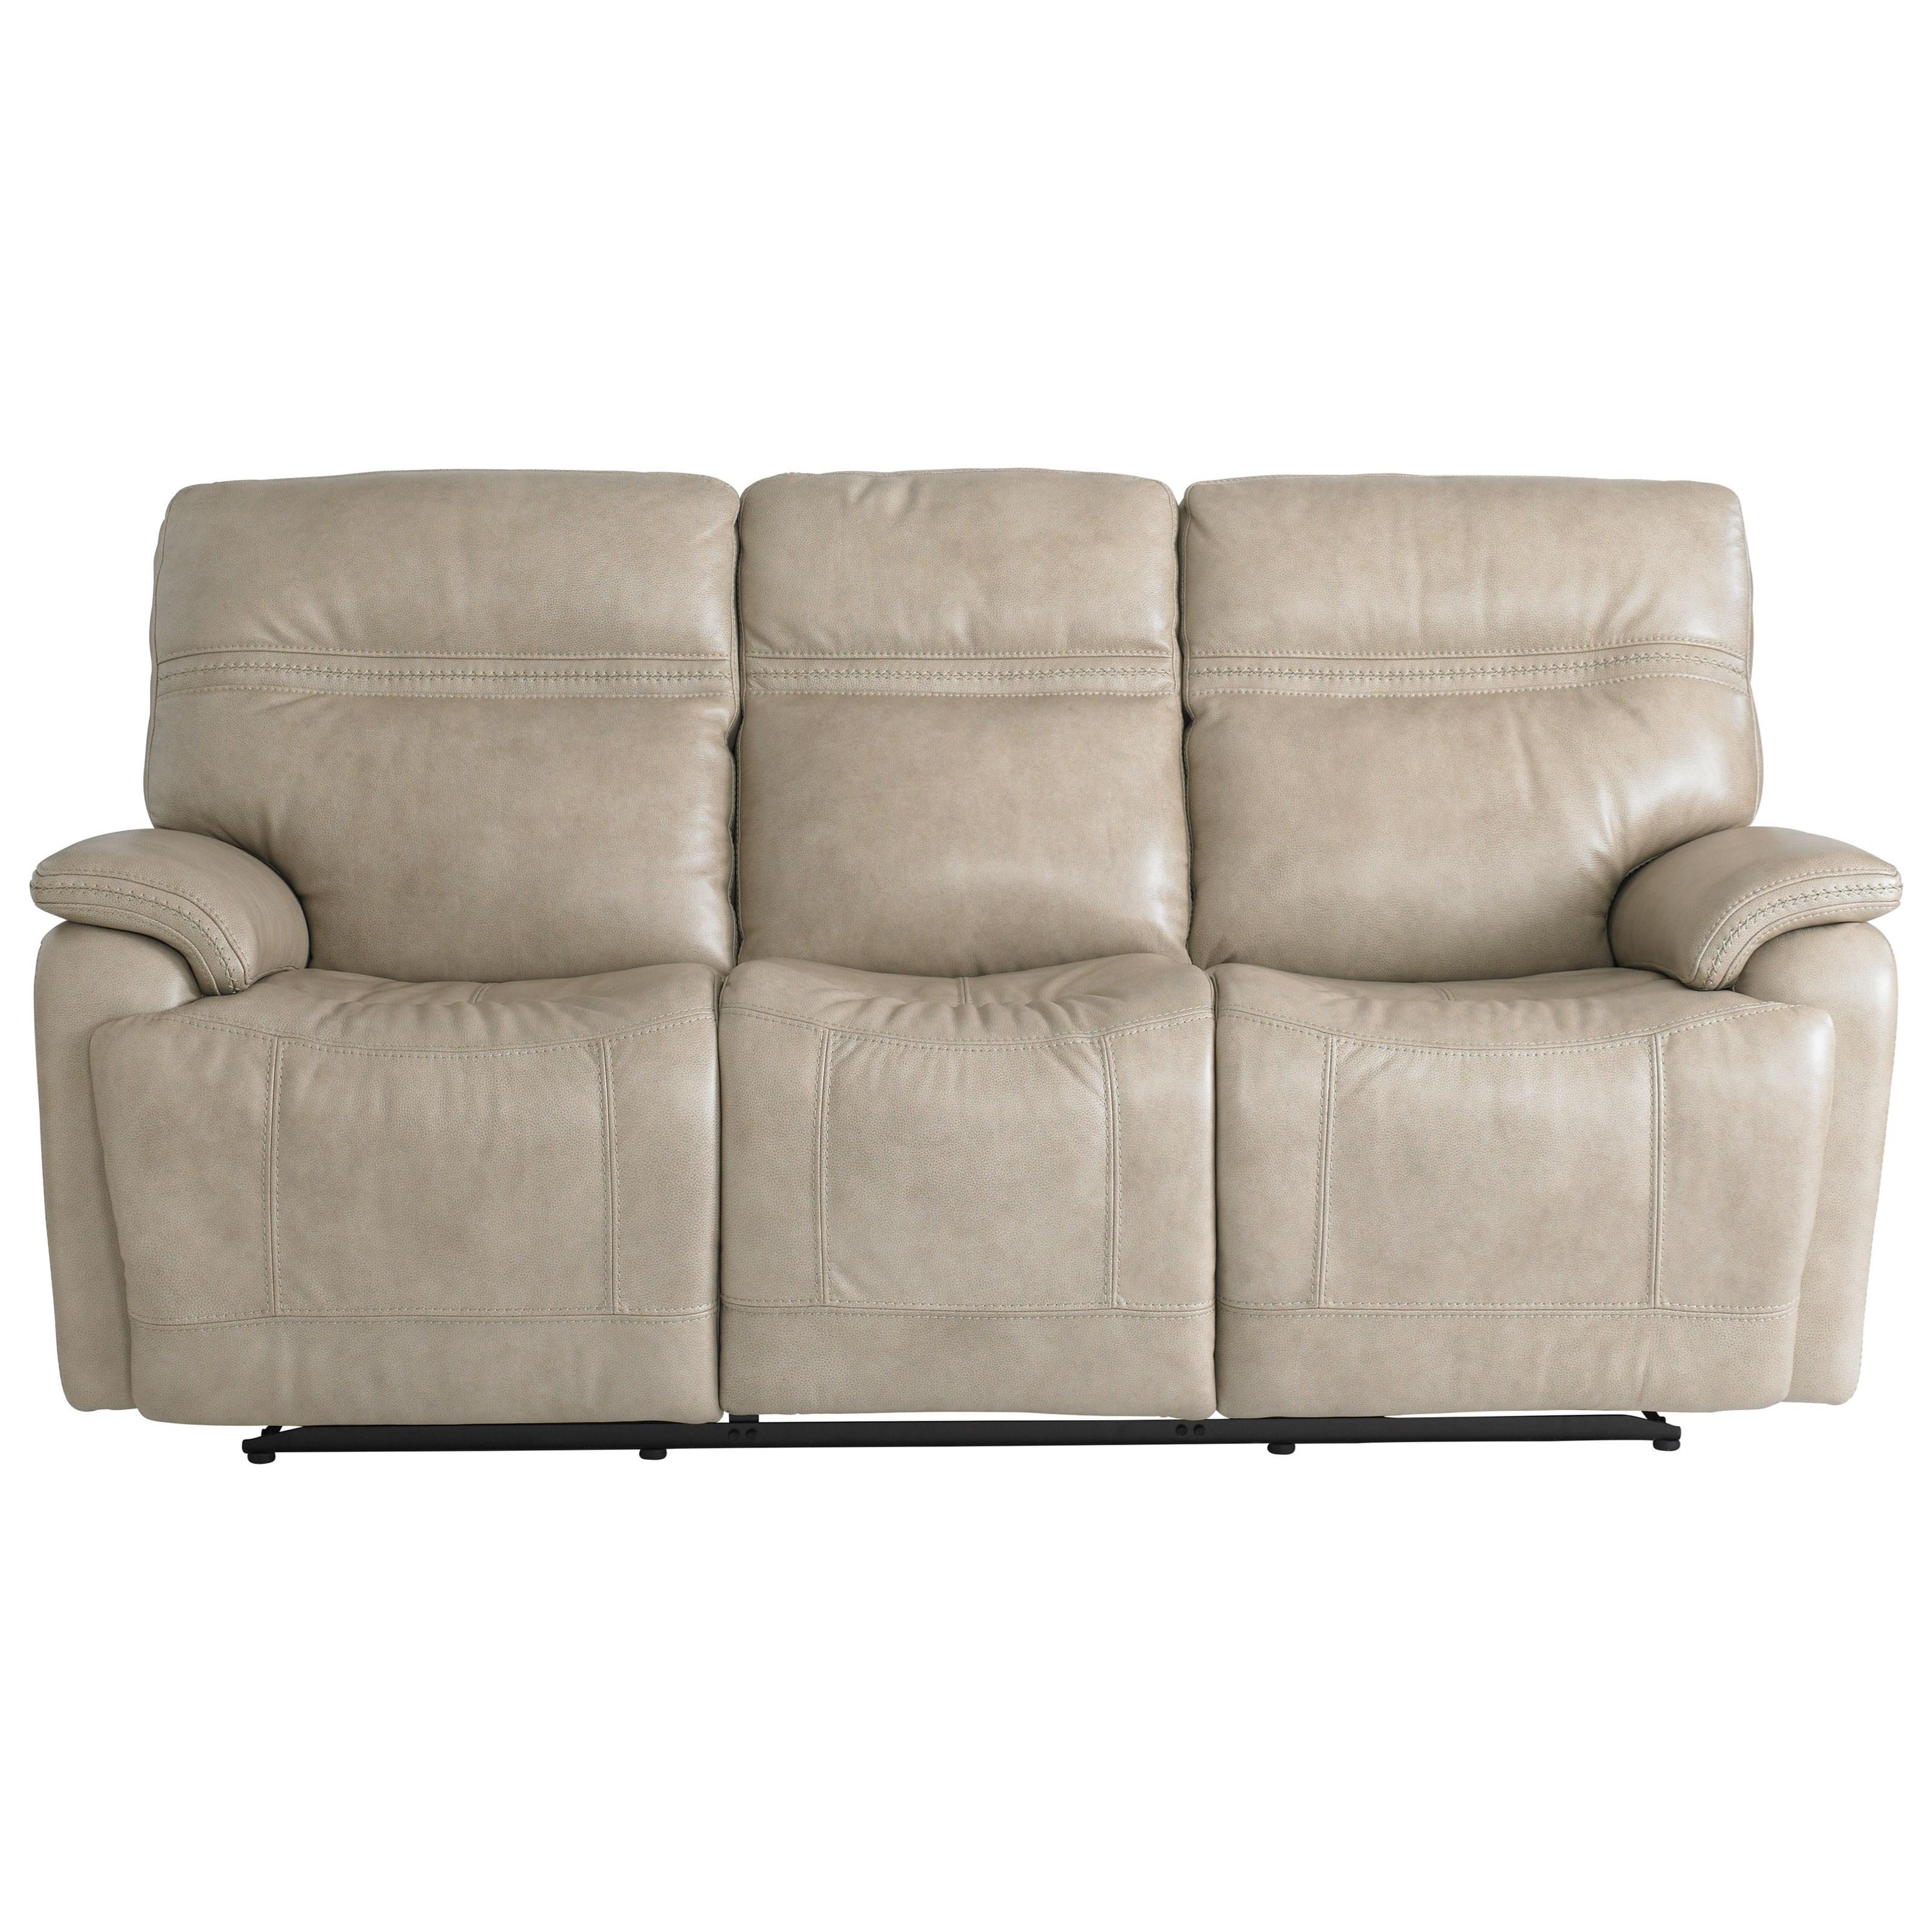 Club Level - Grant Power Reclining Sofa by Bassett at Bassett of Cool Springs